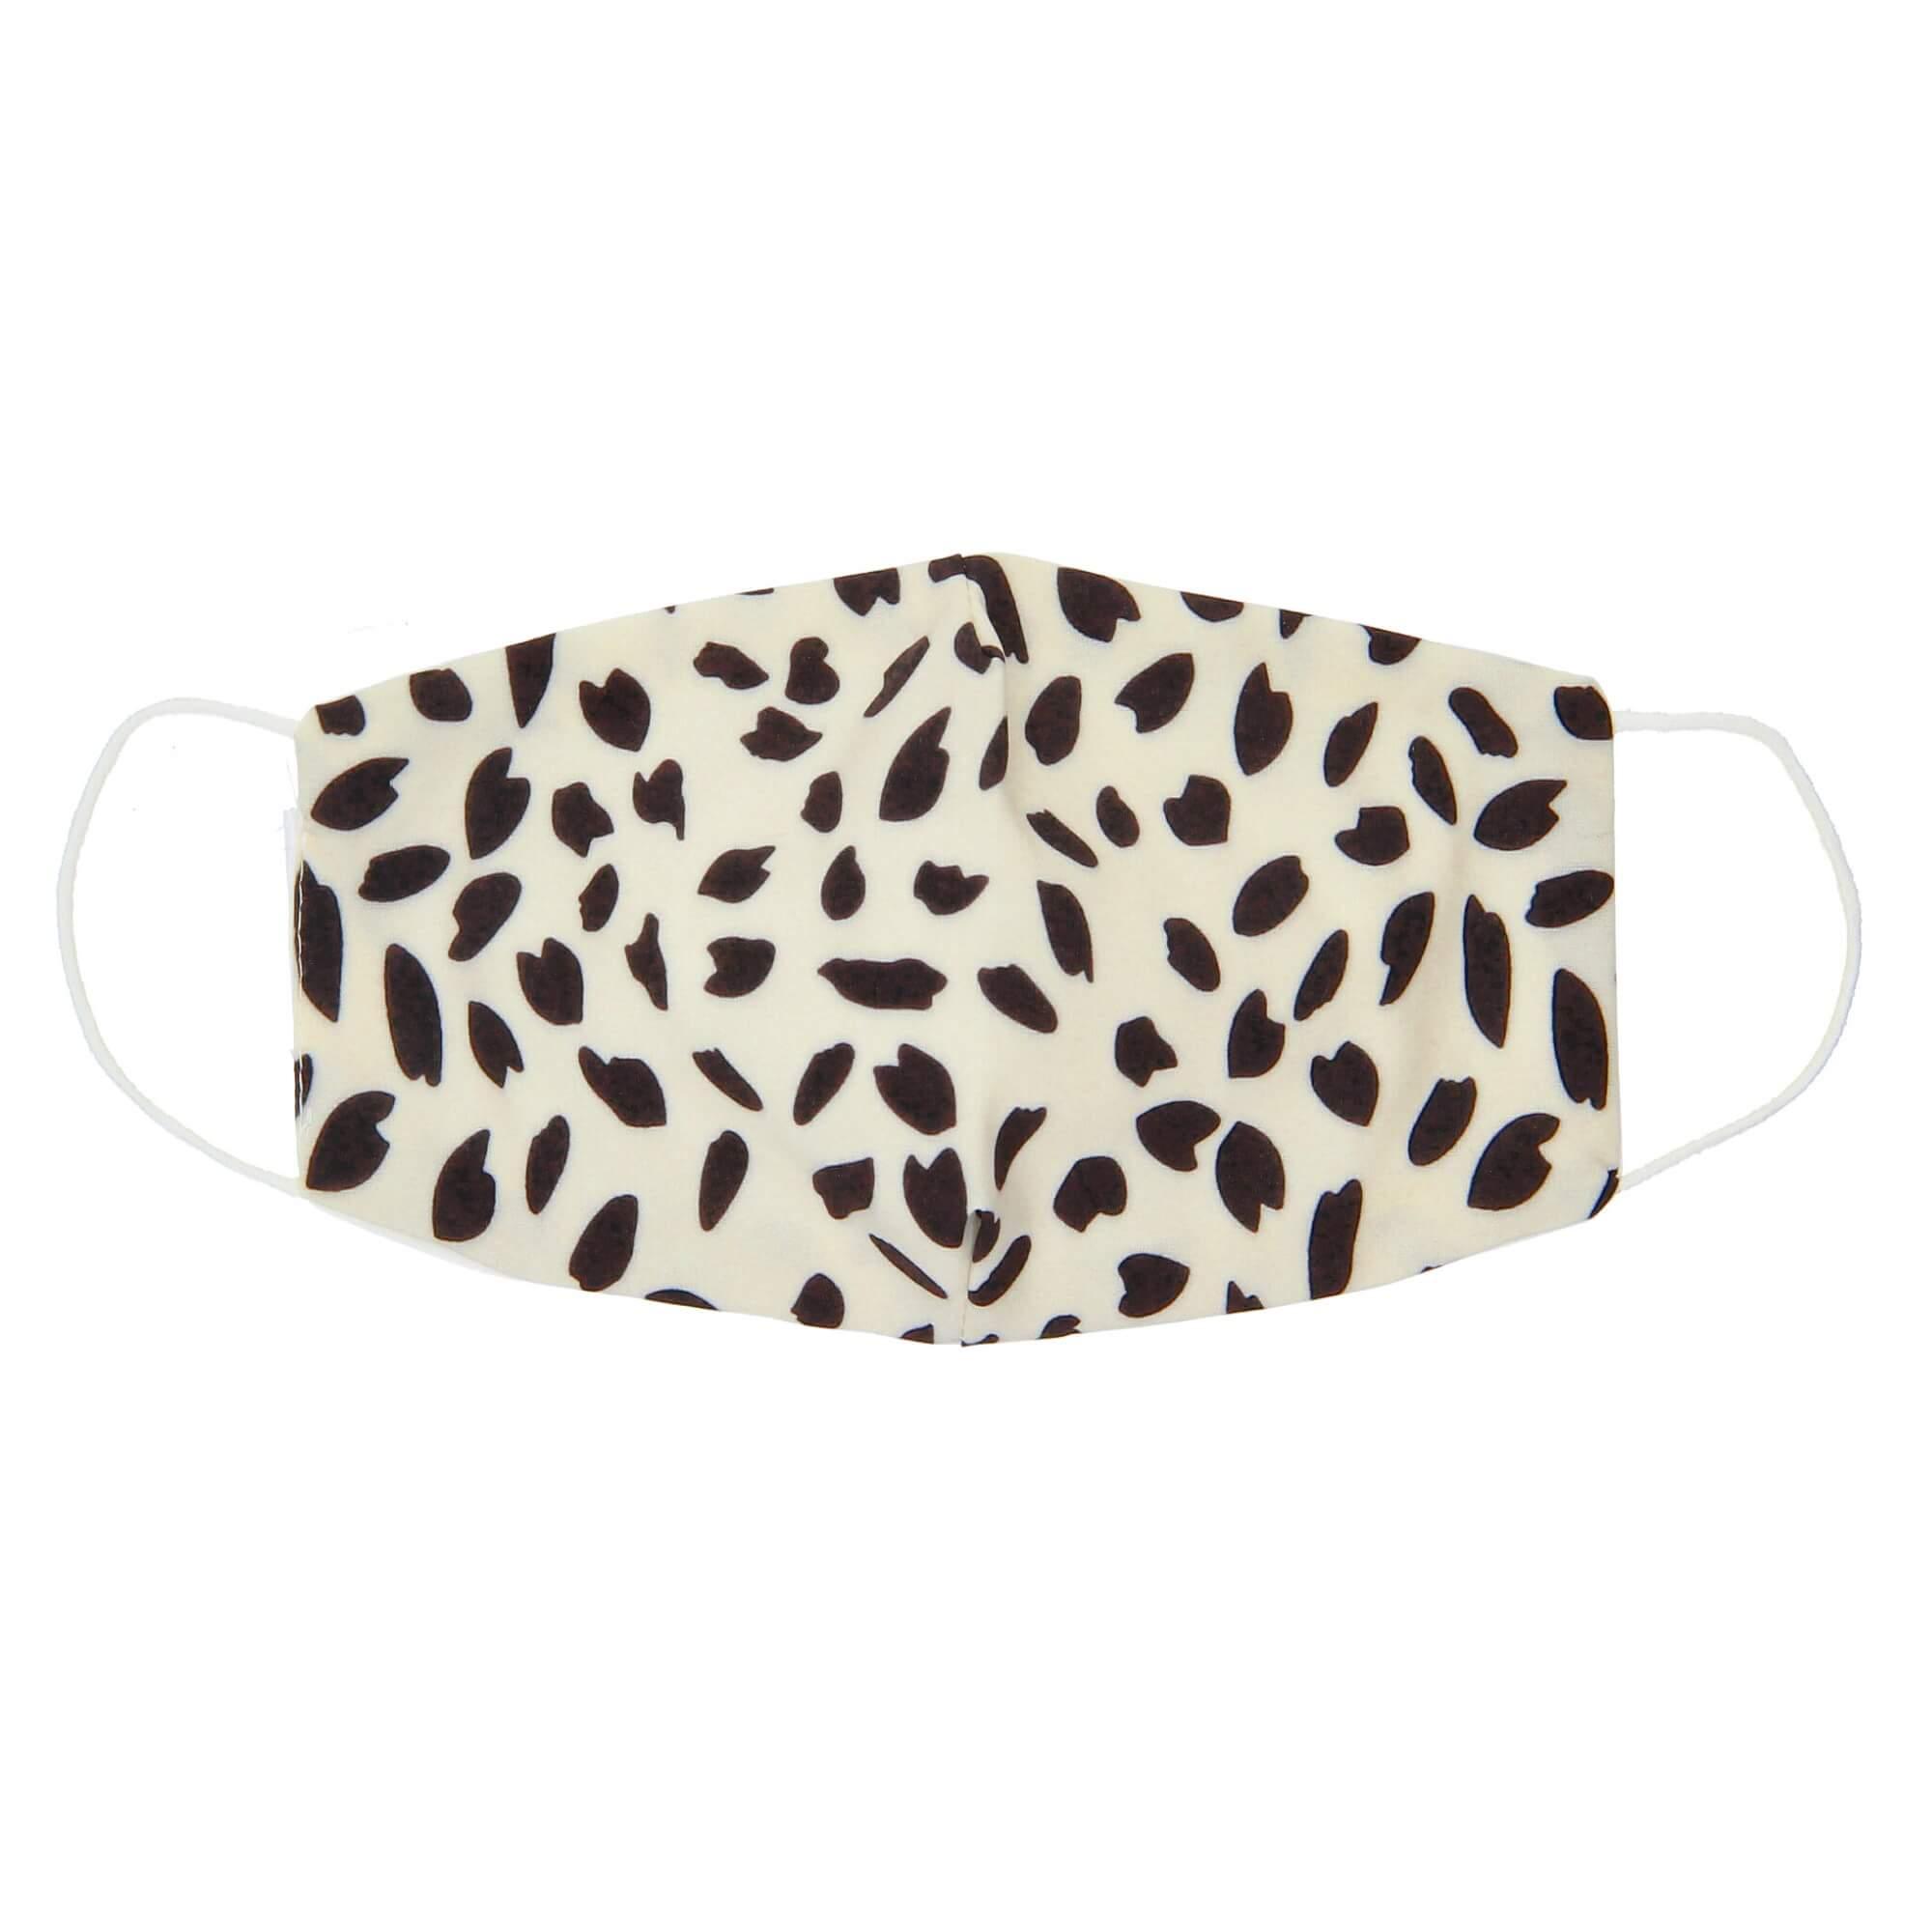 Wasbare Katoenen Mondkapje Cheetah